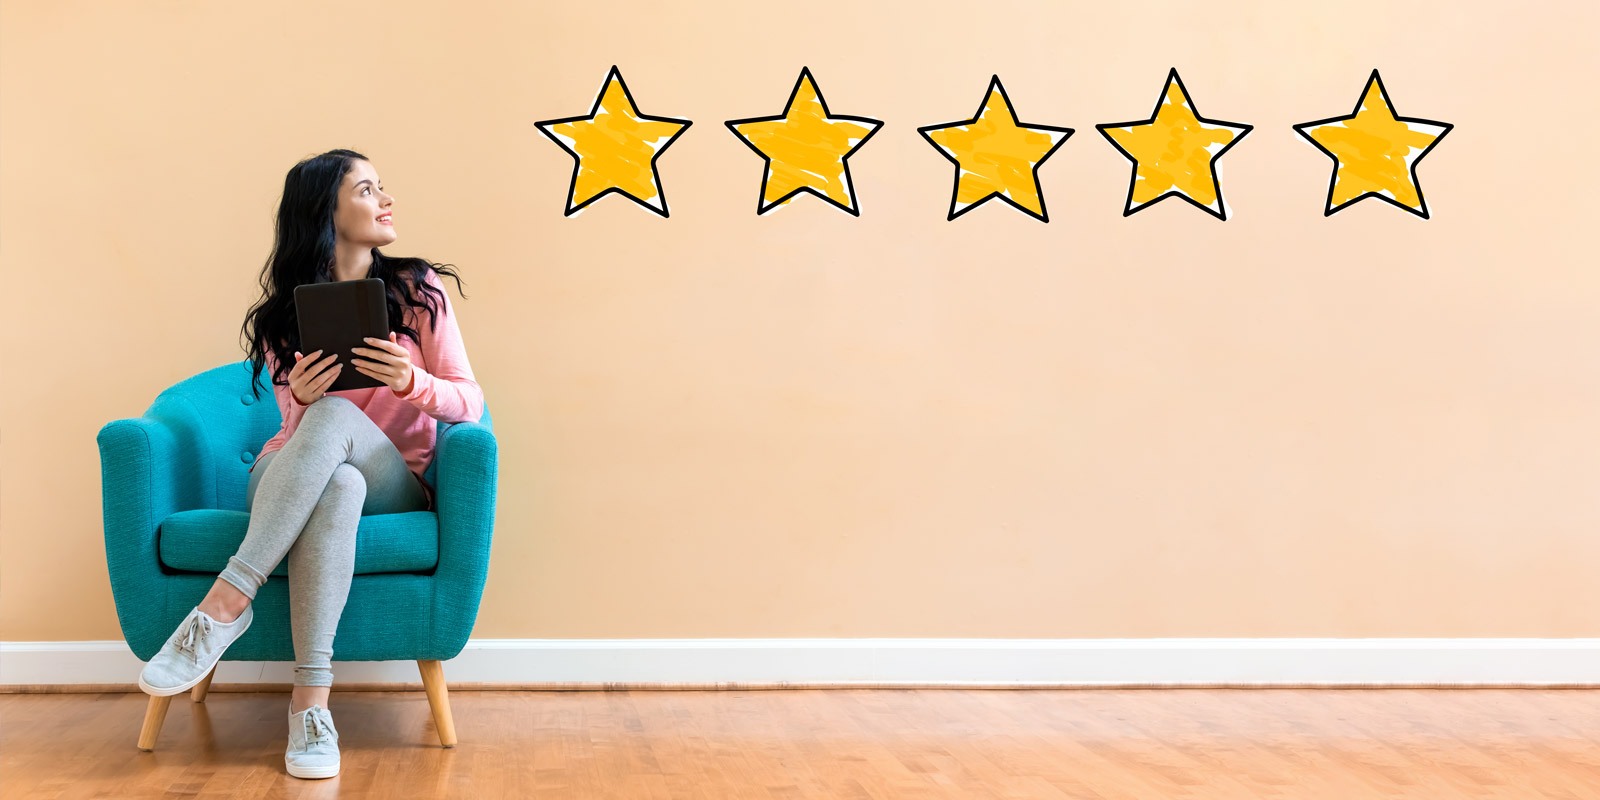 Obtaining customer feedback: Part two Image